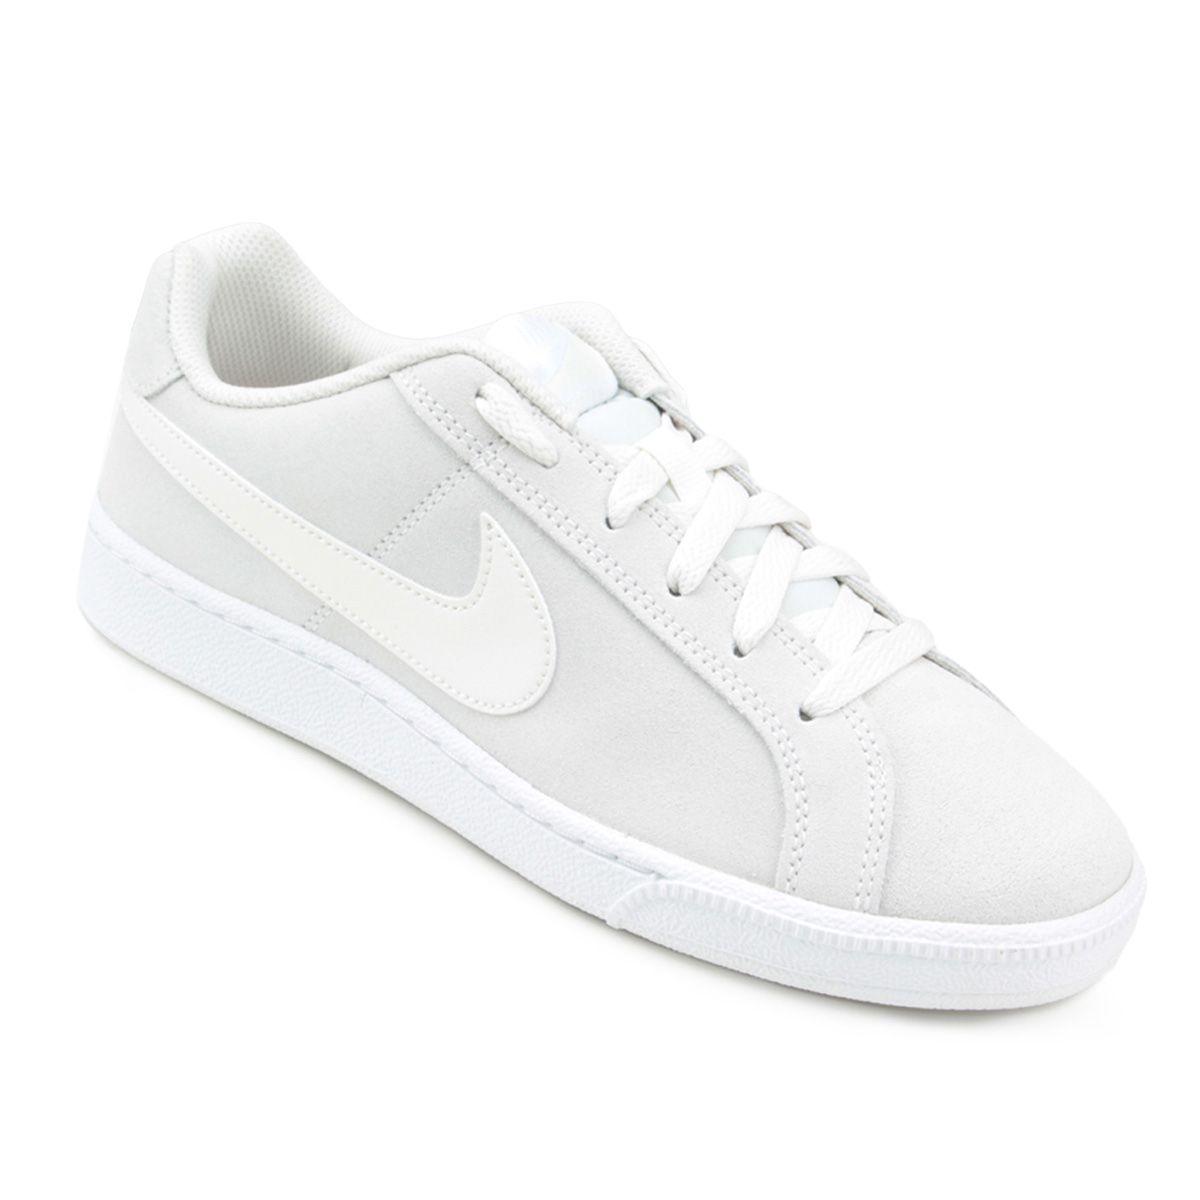 5d60731bd7 Tênis Nike Wmns Court Royale Masculino NETSHOES white | Tênis em ...